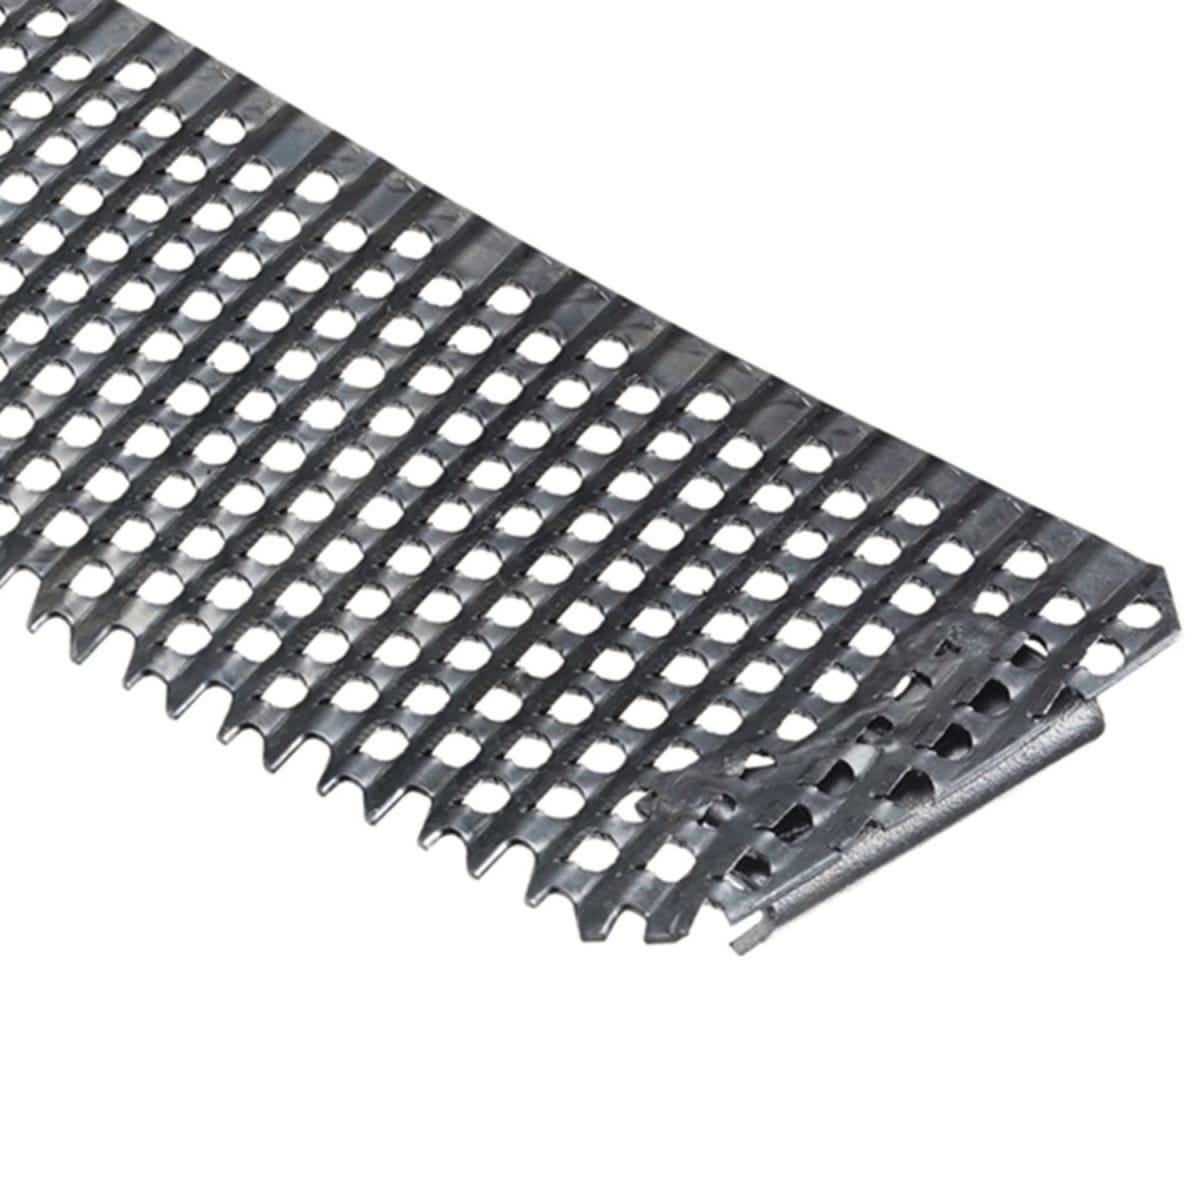 Stanley 255mm Surform Standard Cut Blade